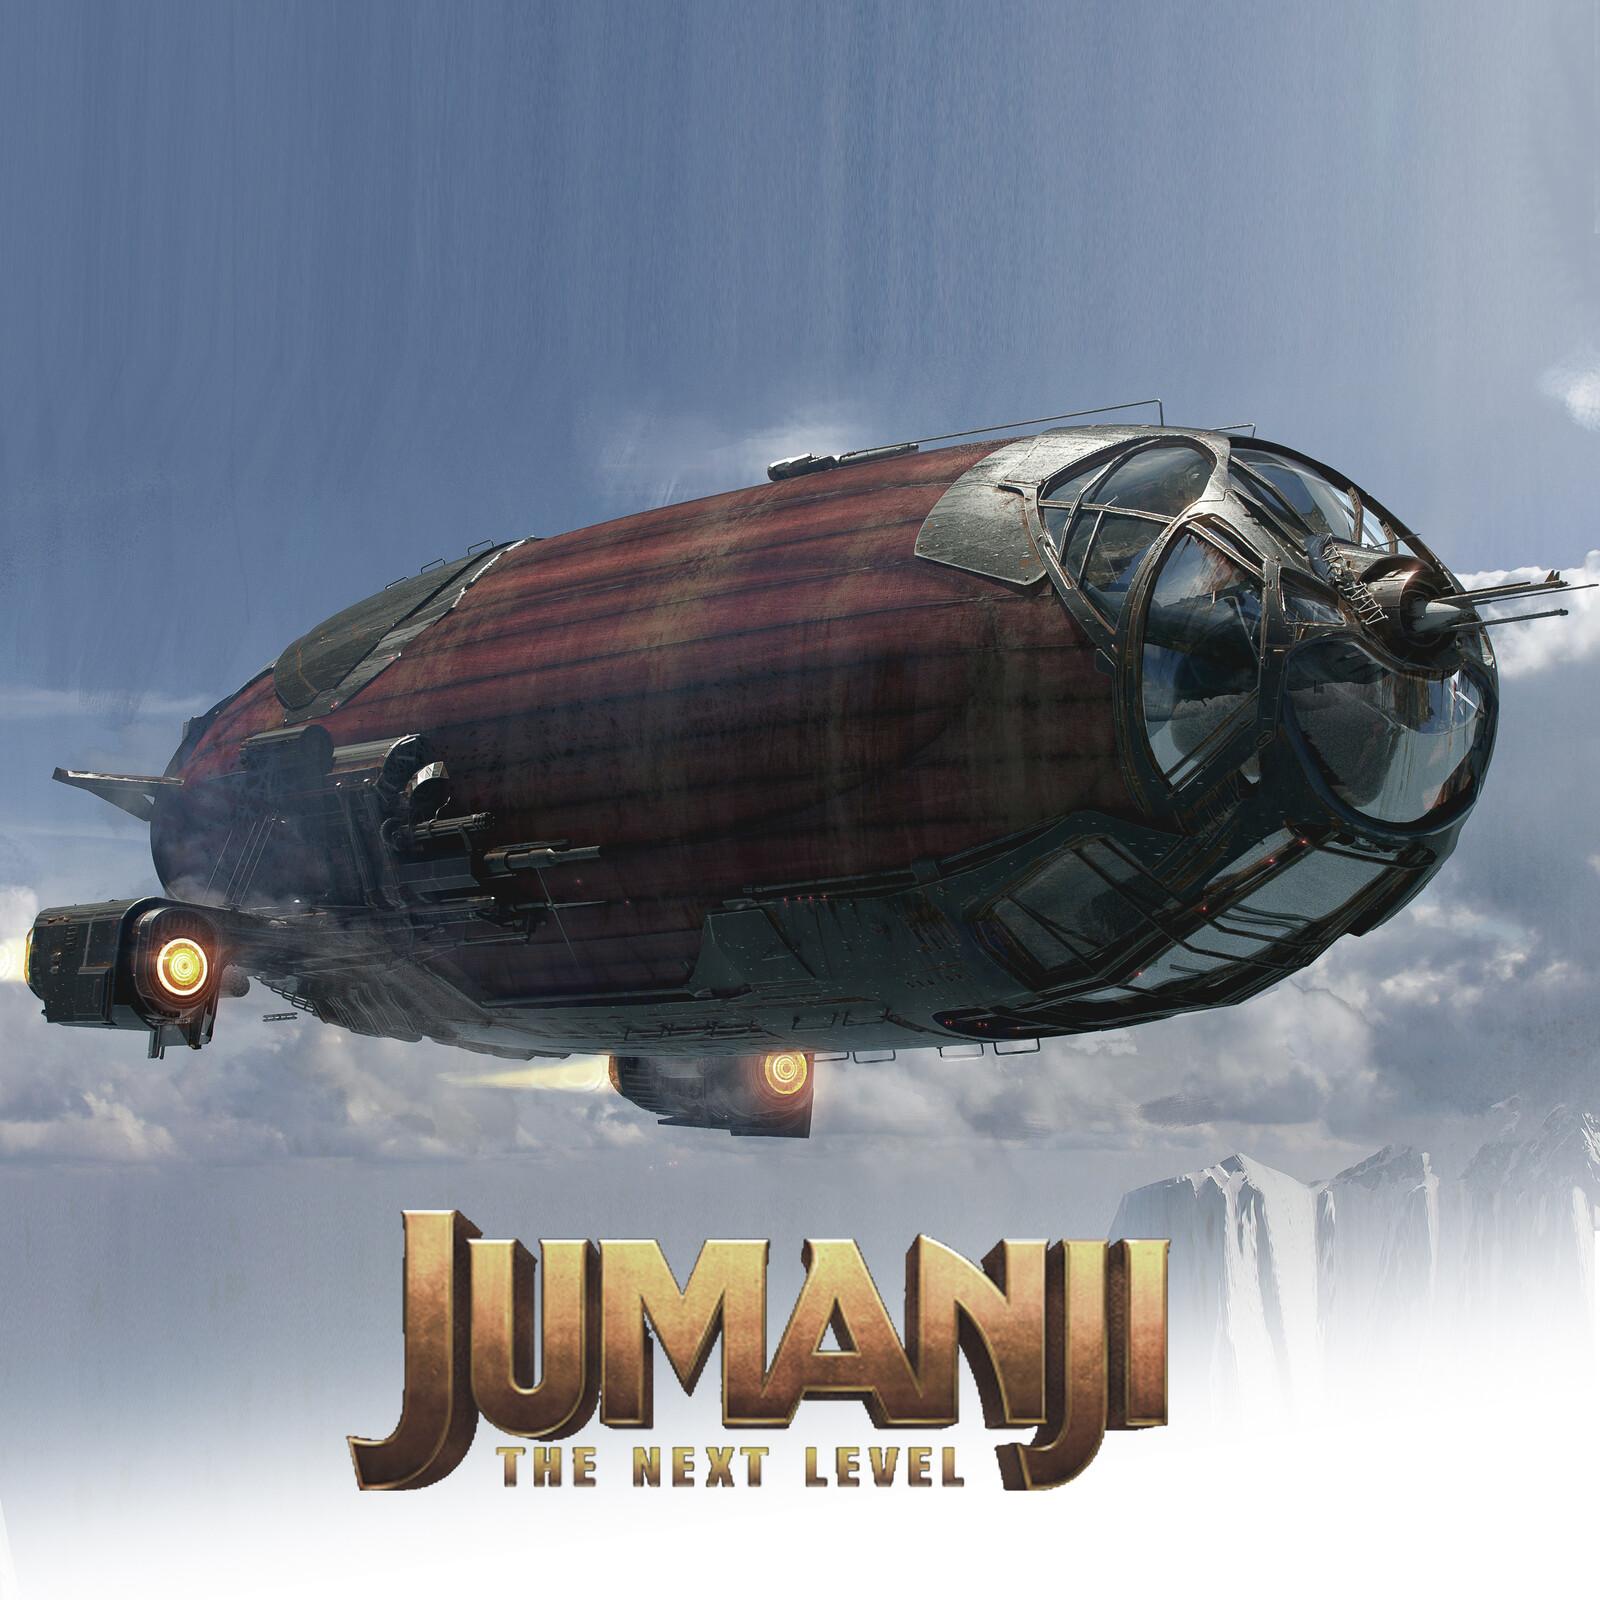 Jumanji: The Next Level. Blimp Designs